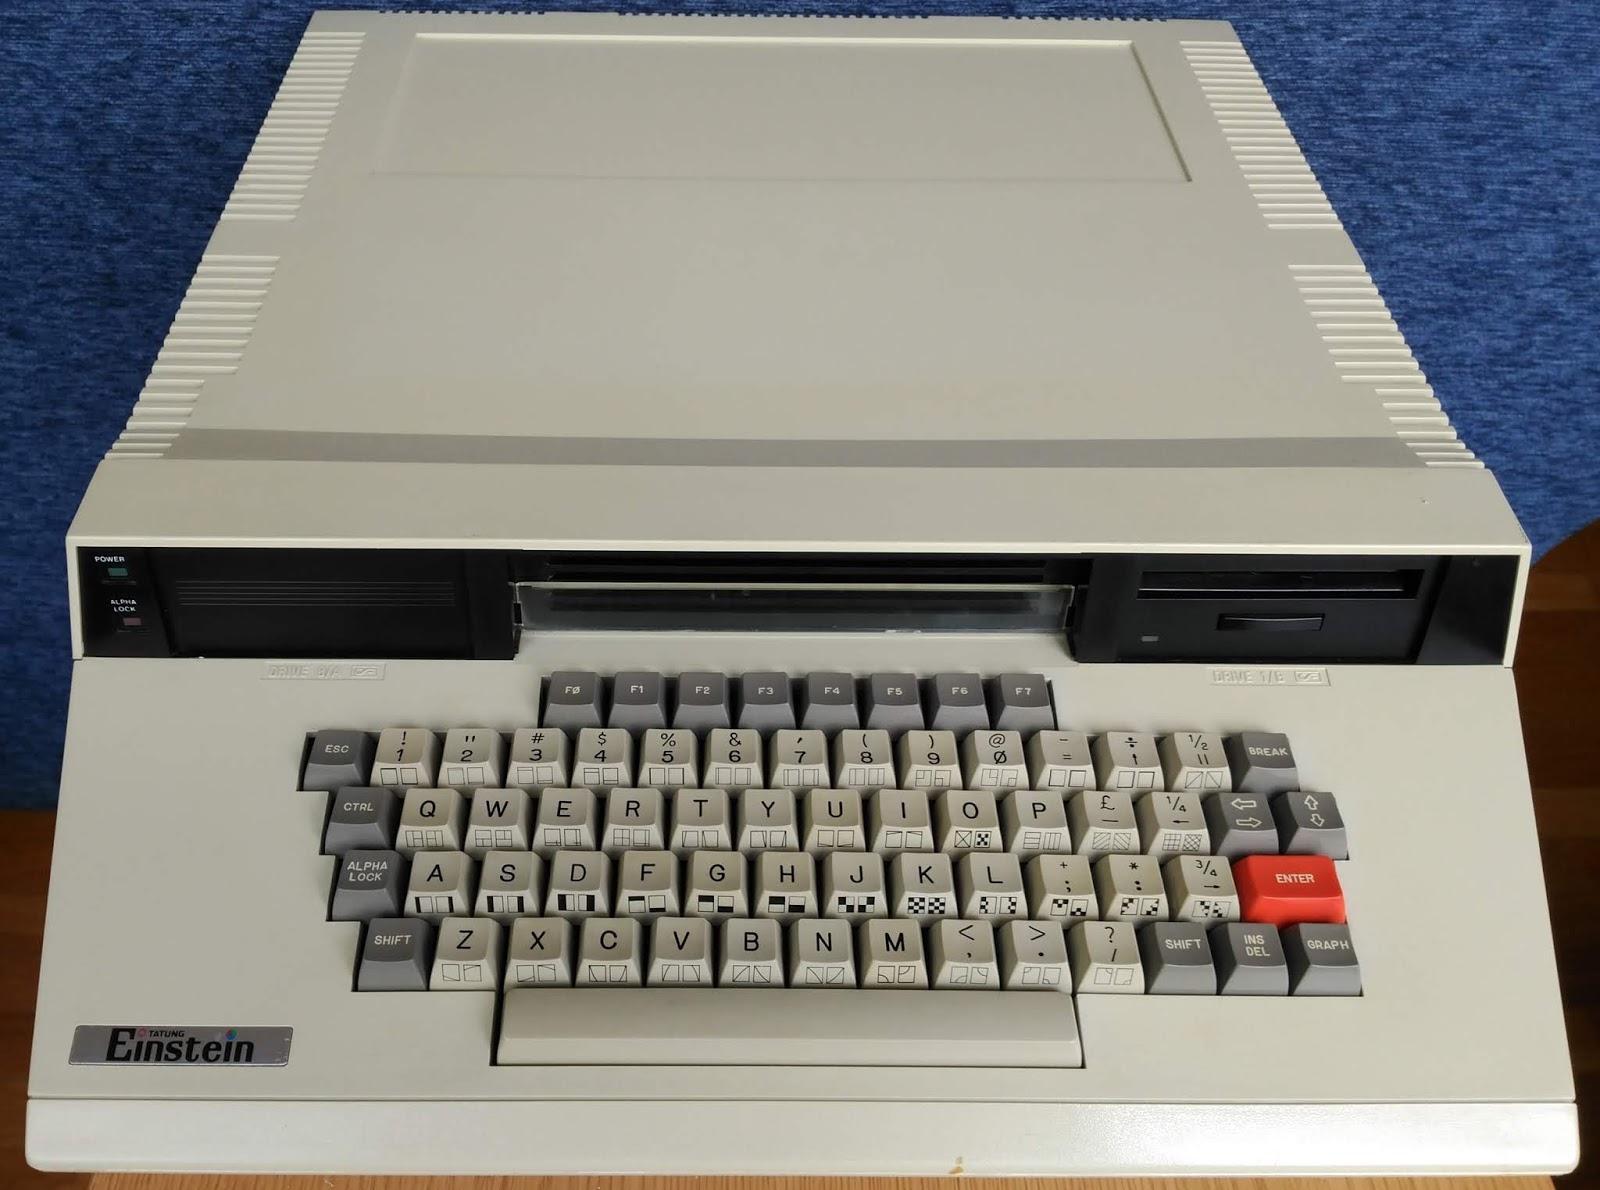 medium resolution of enlace al ordenador tatung einstein